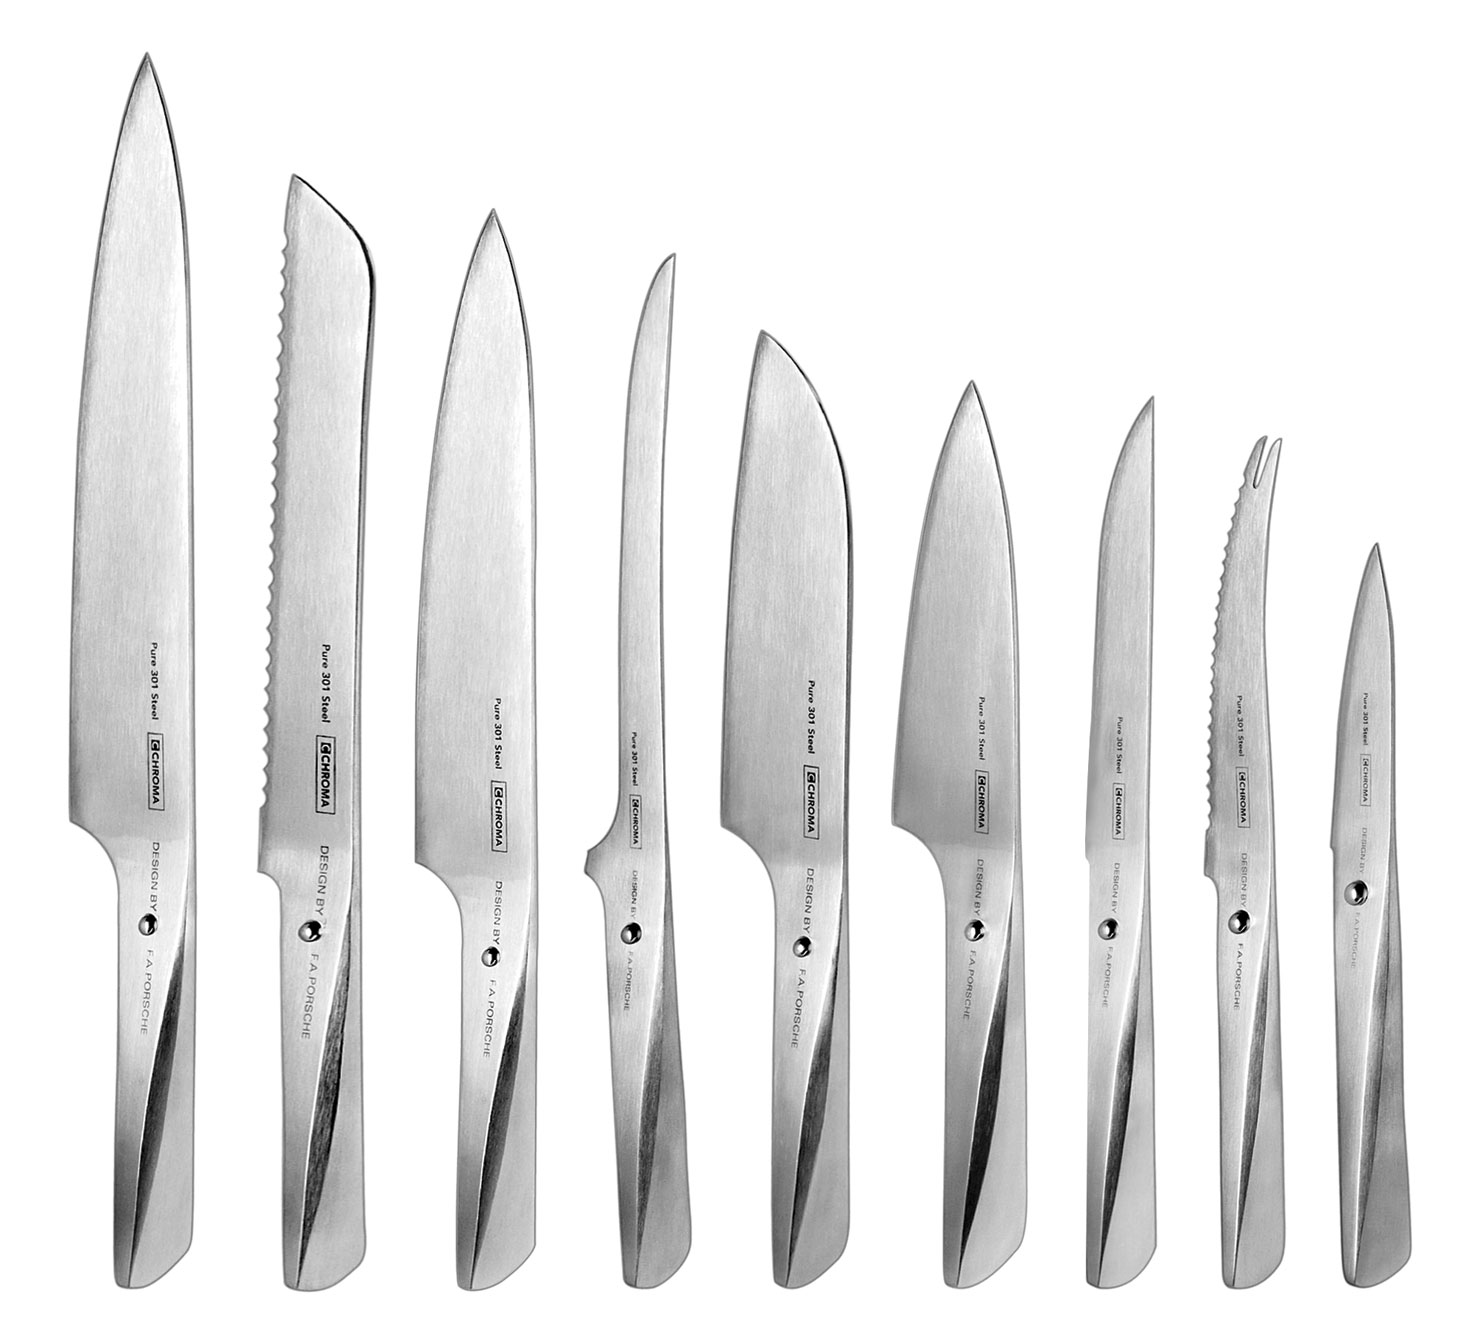 Chroma Type 301 10 Piece Knife Block